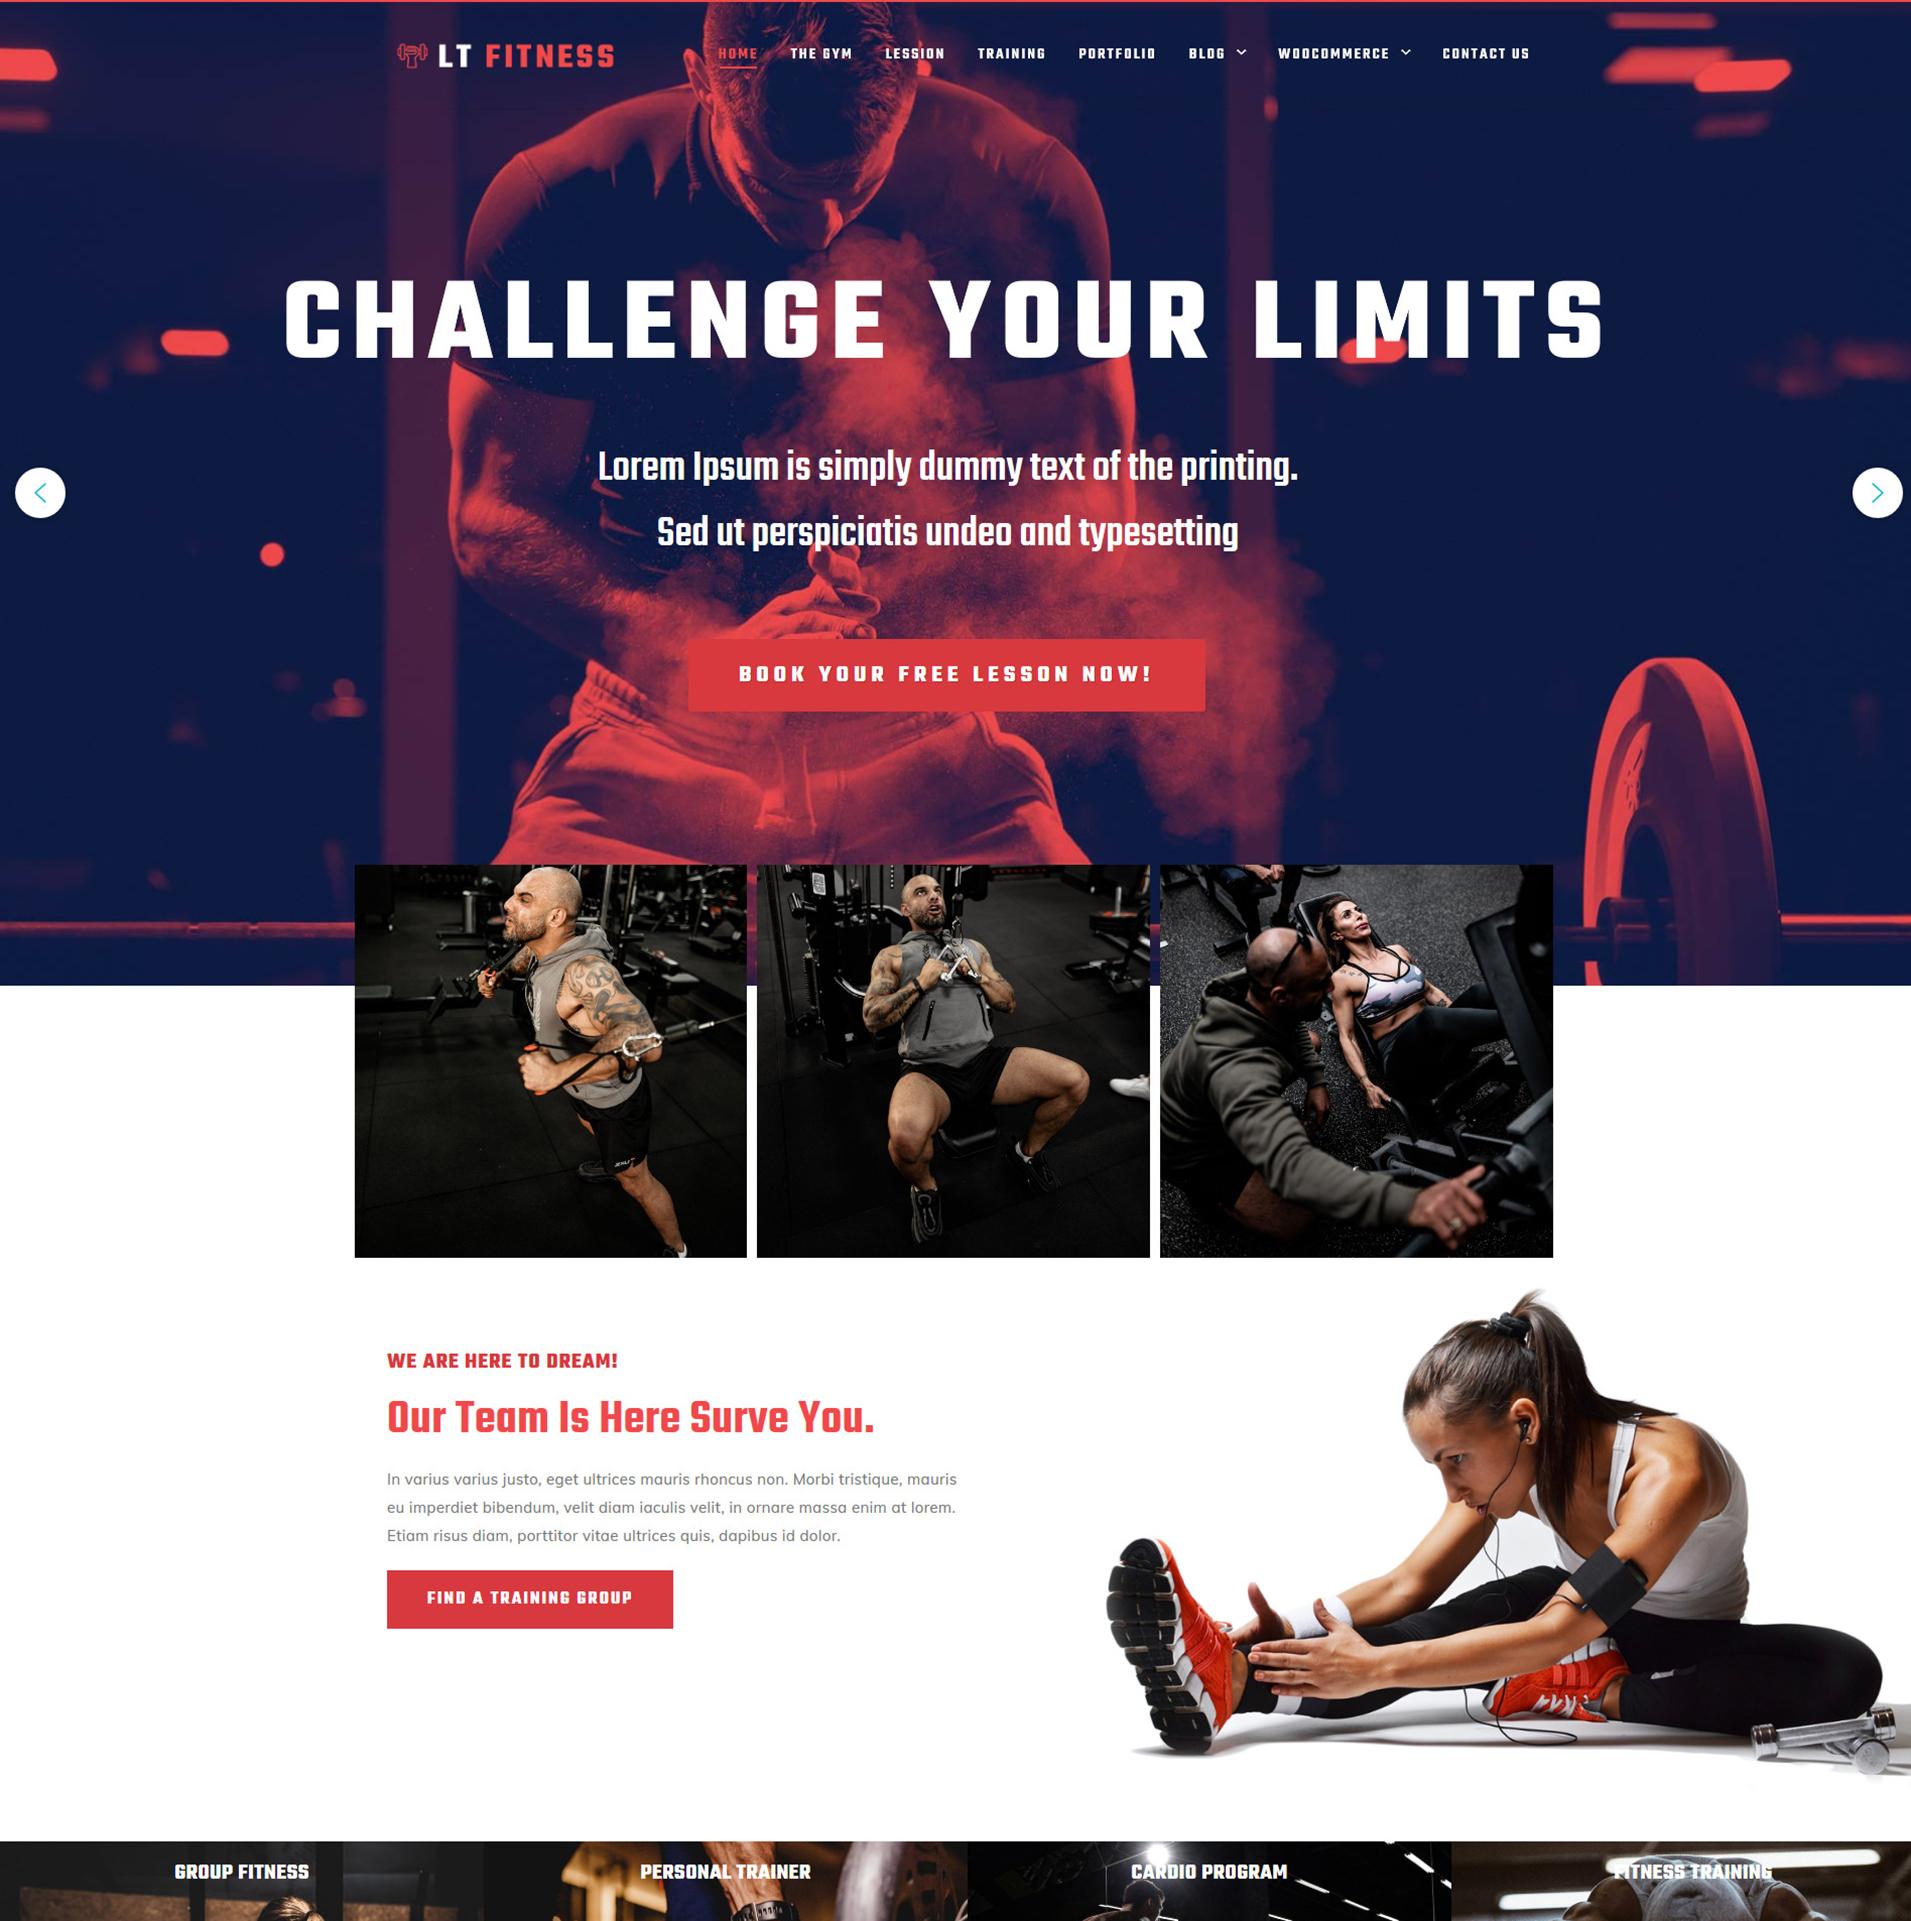 lt-fitness-wordpress-theme-full